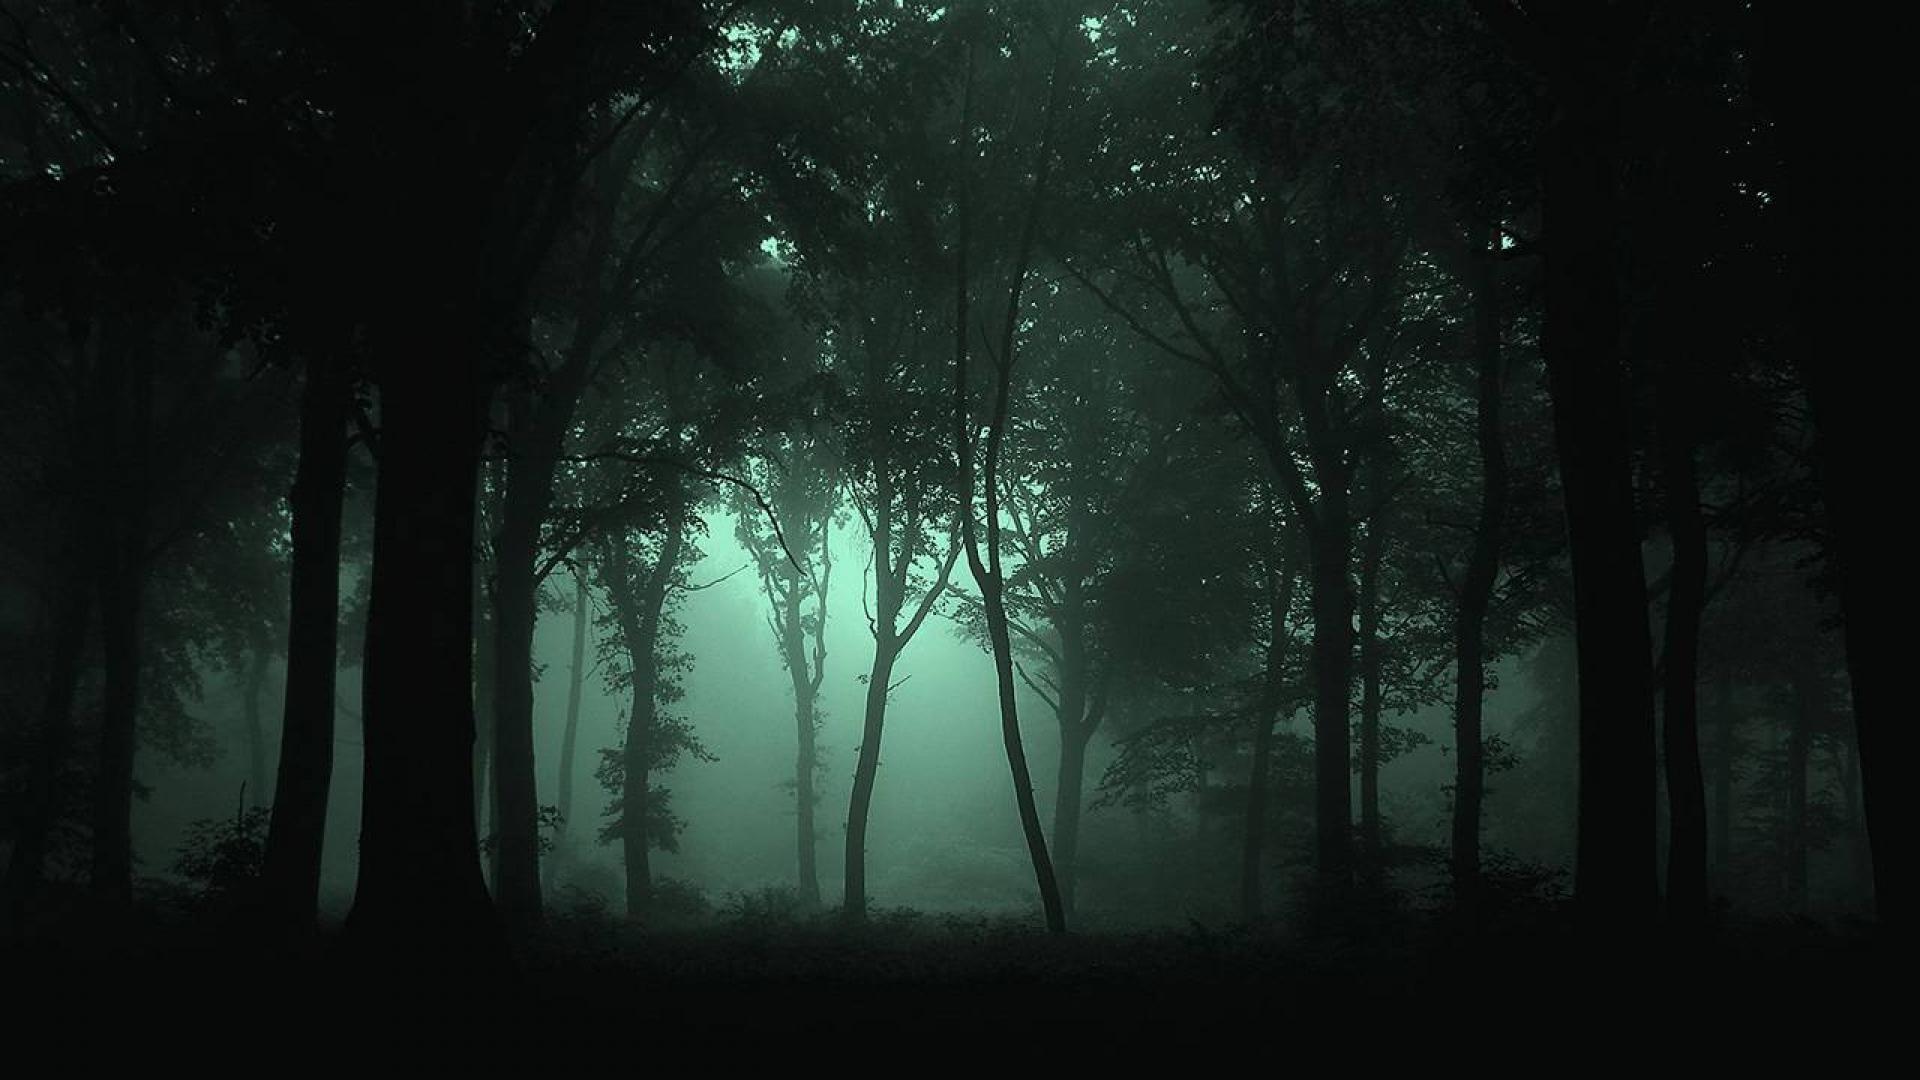 High Resolution Dark Forest Wallpaper Hd